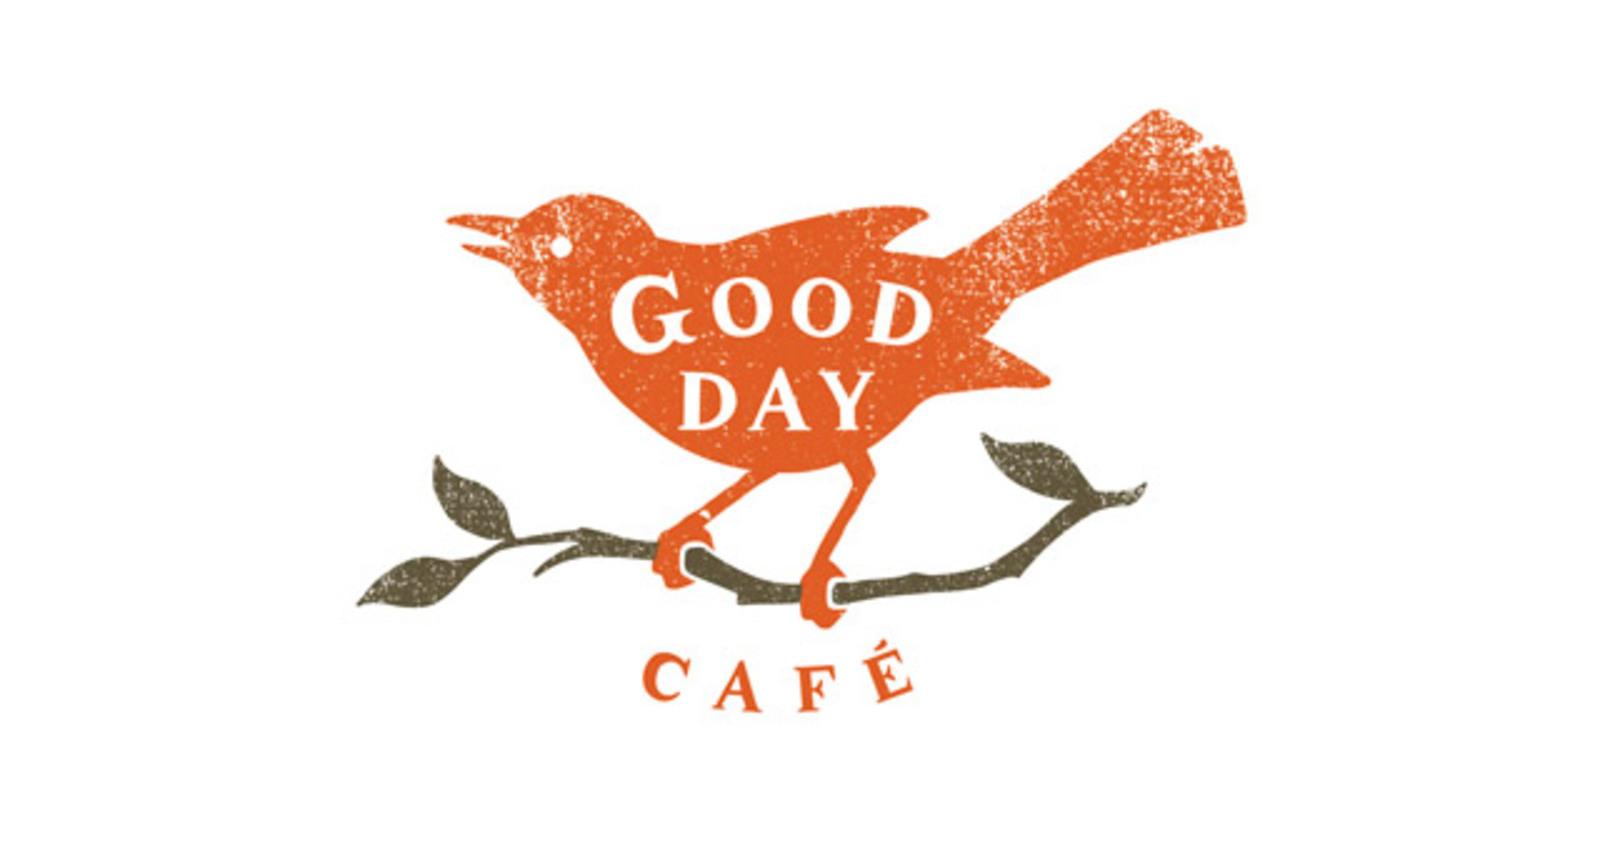 Good Day Cafe Identity